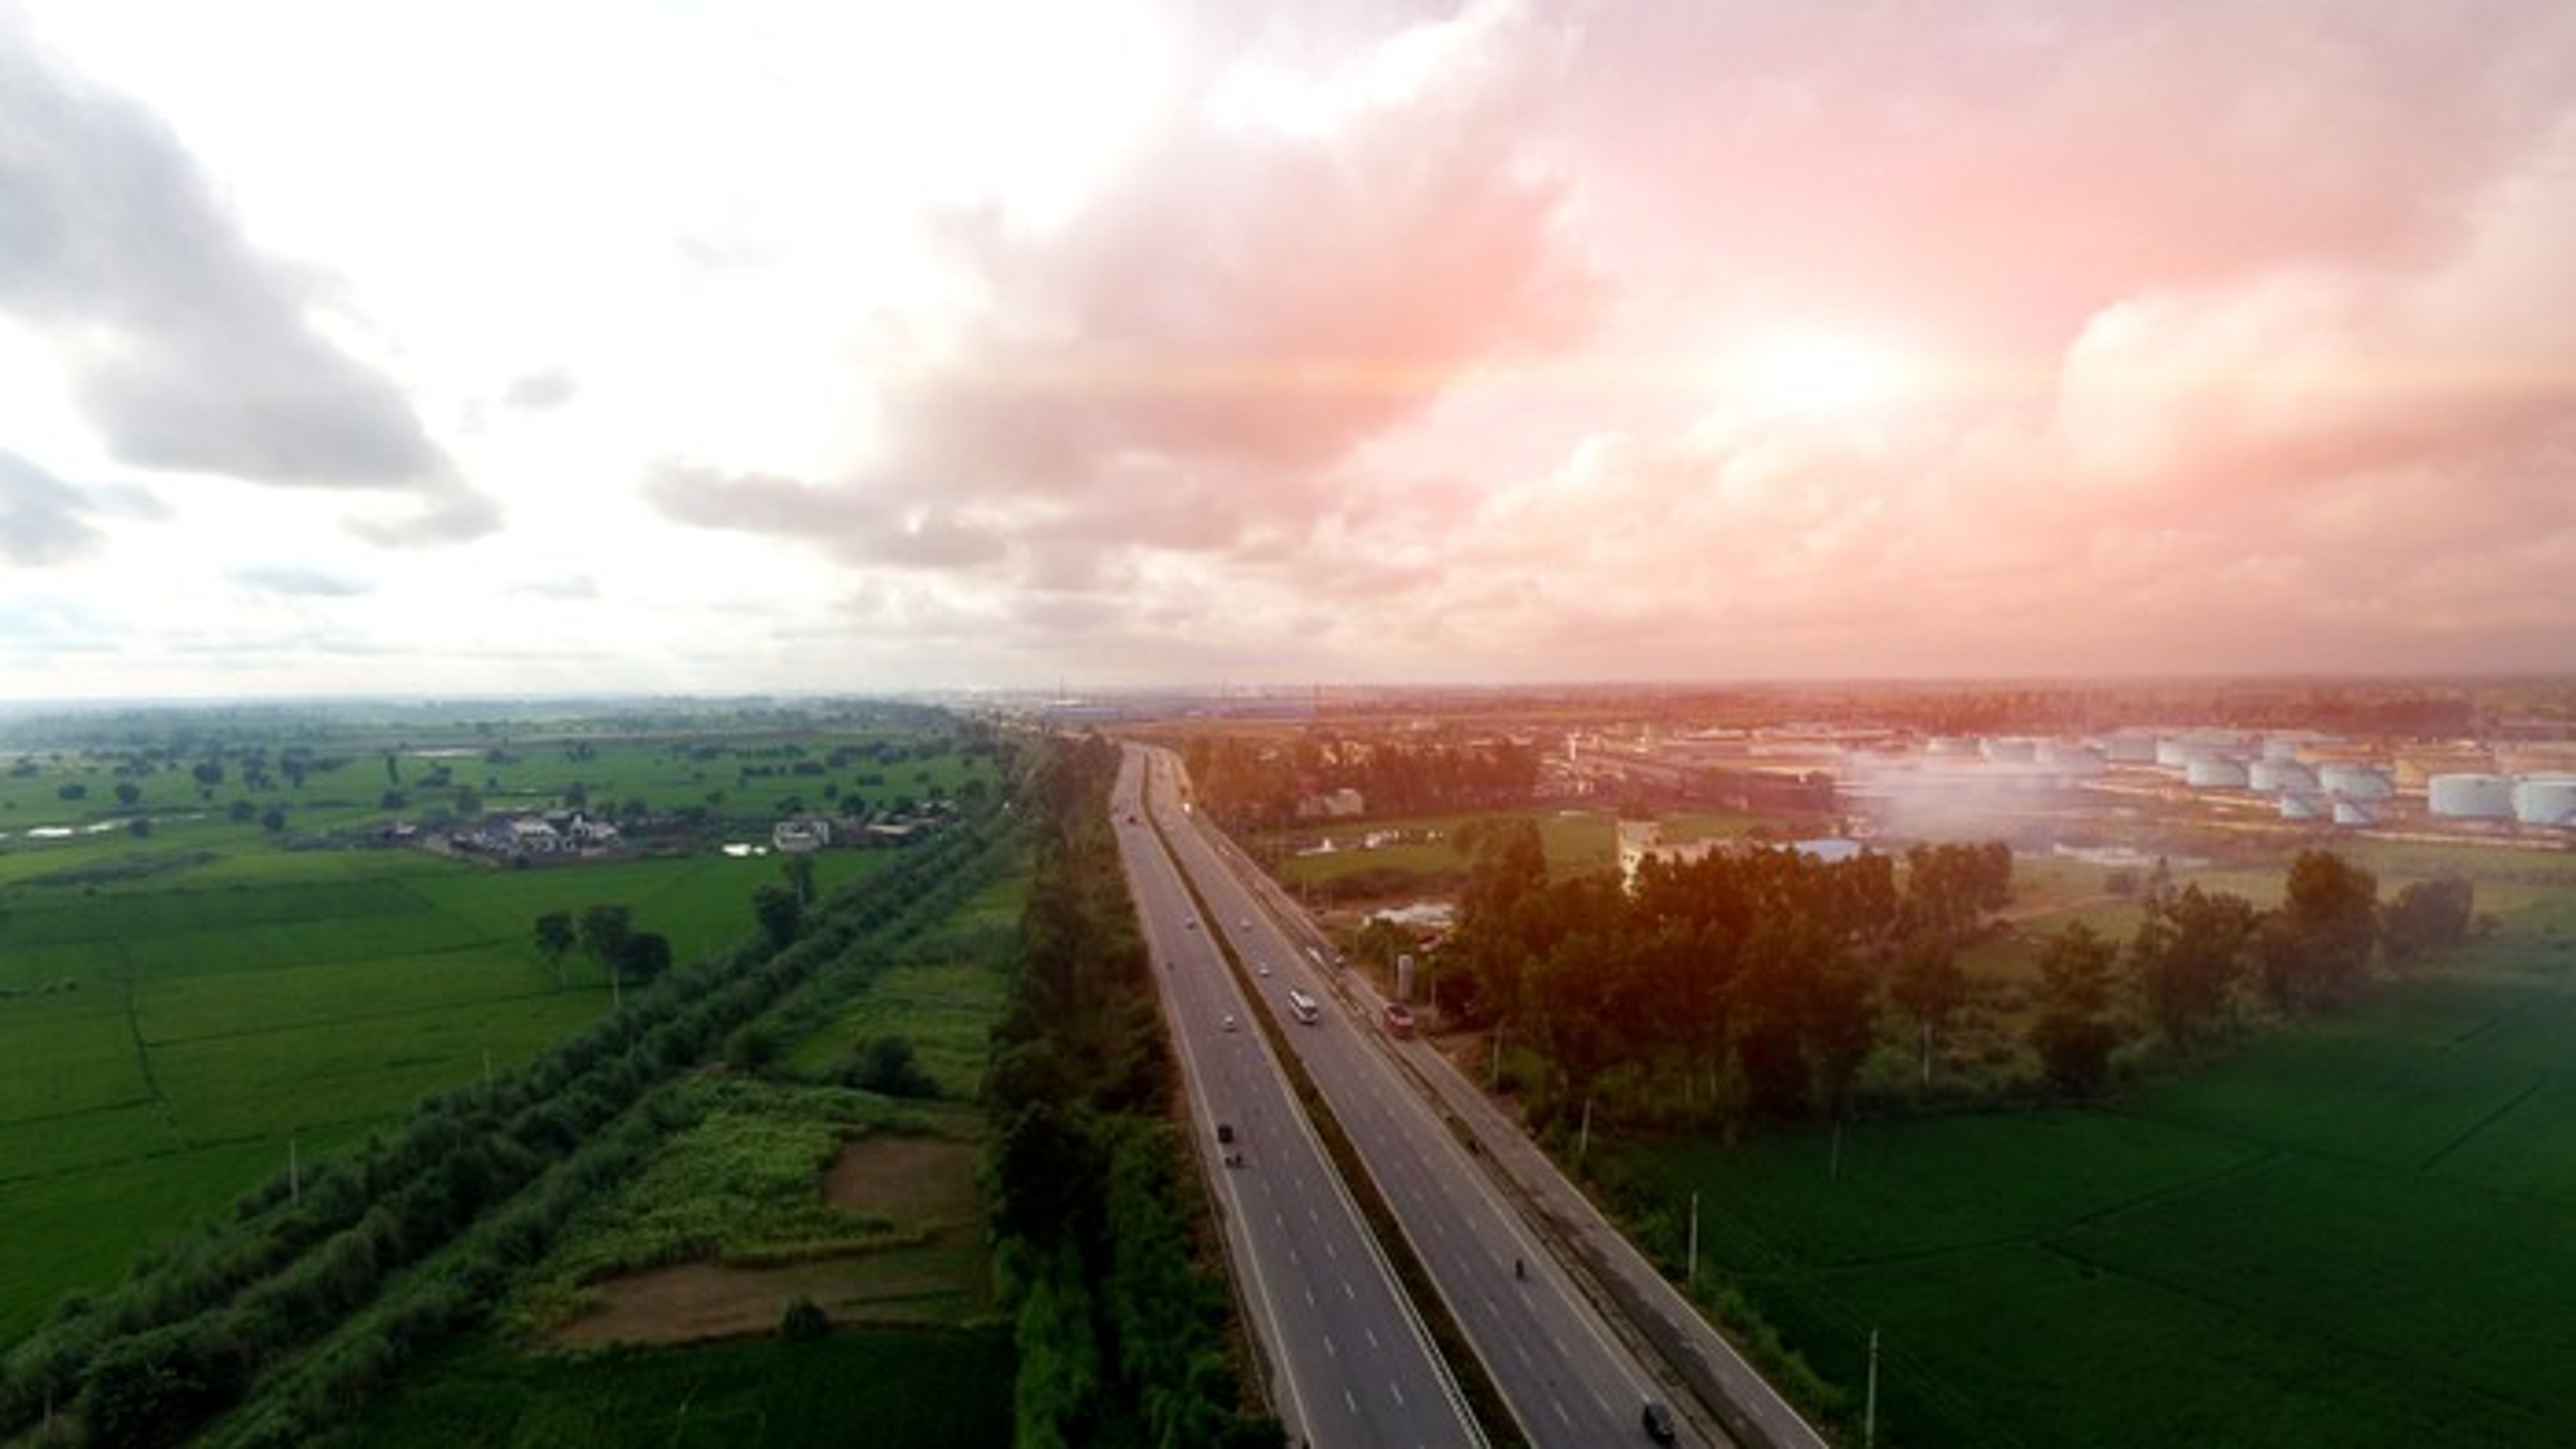 Elevated view of rural highway